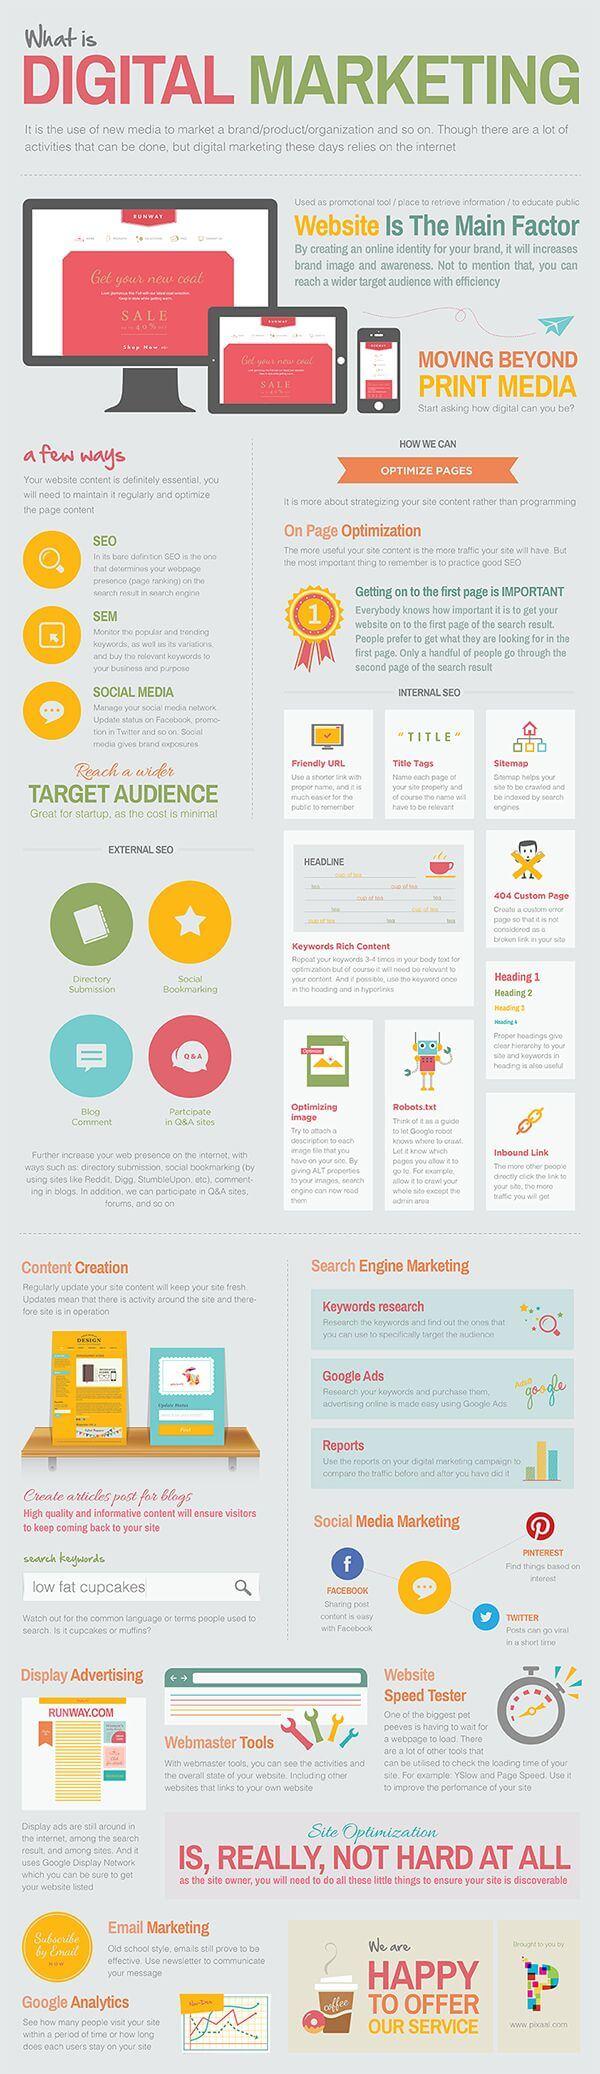 digital marketing through images